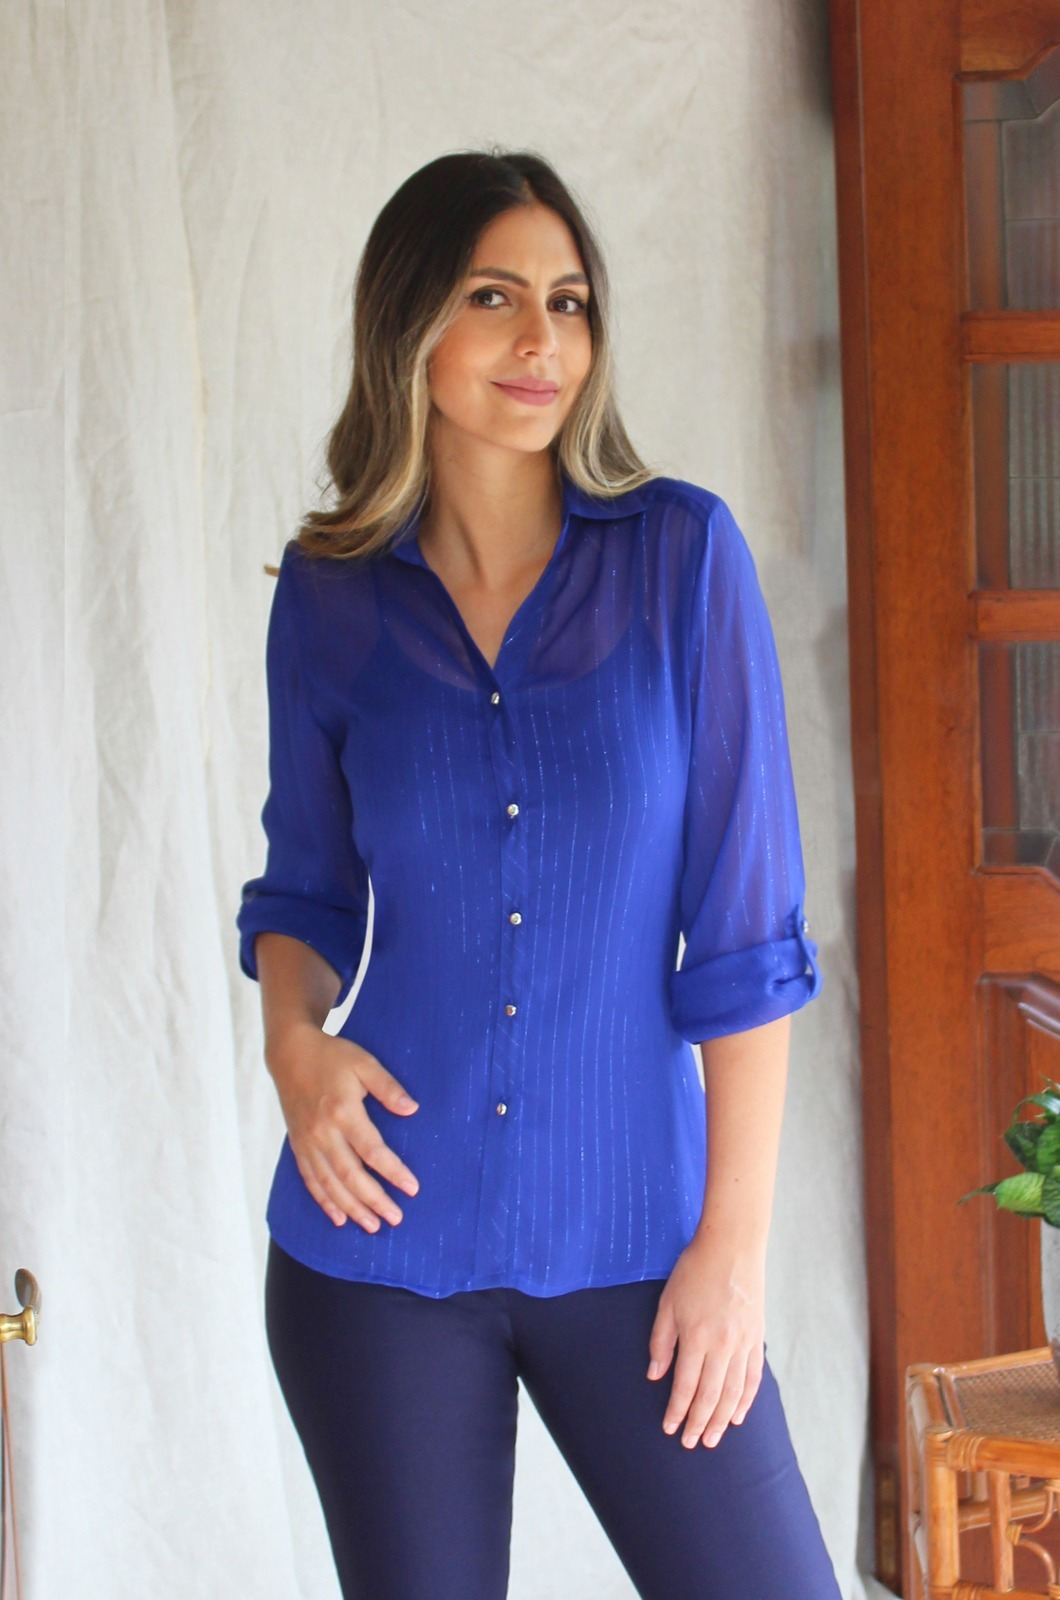 BLUSA-CAMISERA-MANGA-LARGA-Chazari-4026-20-azul